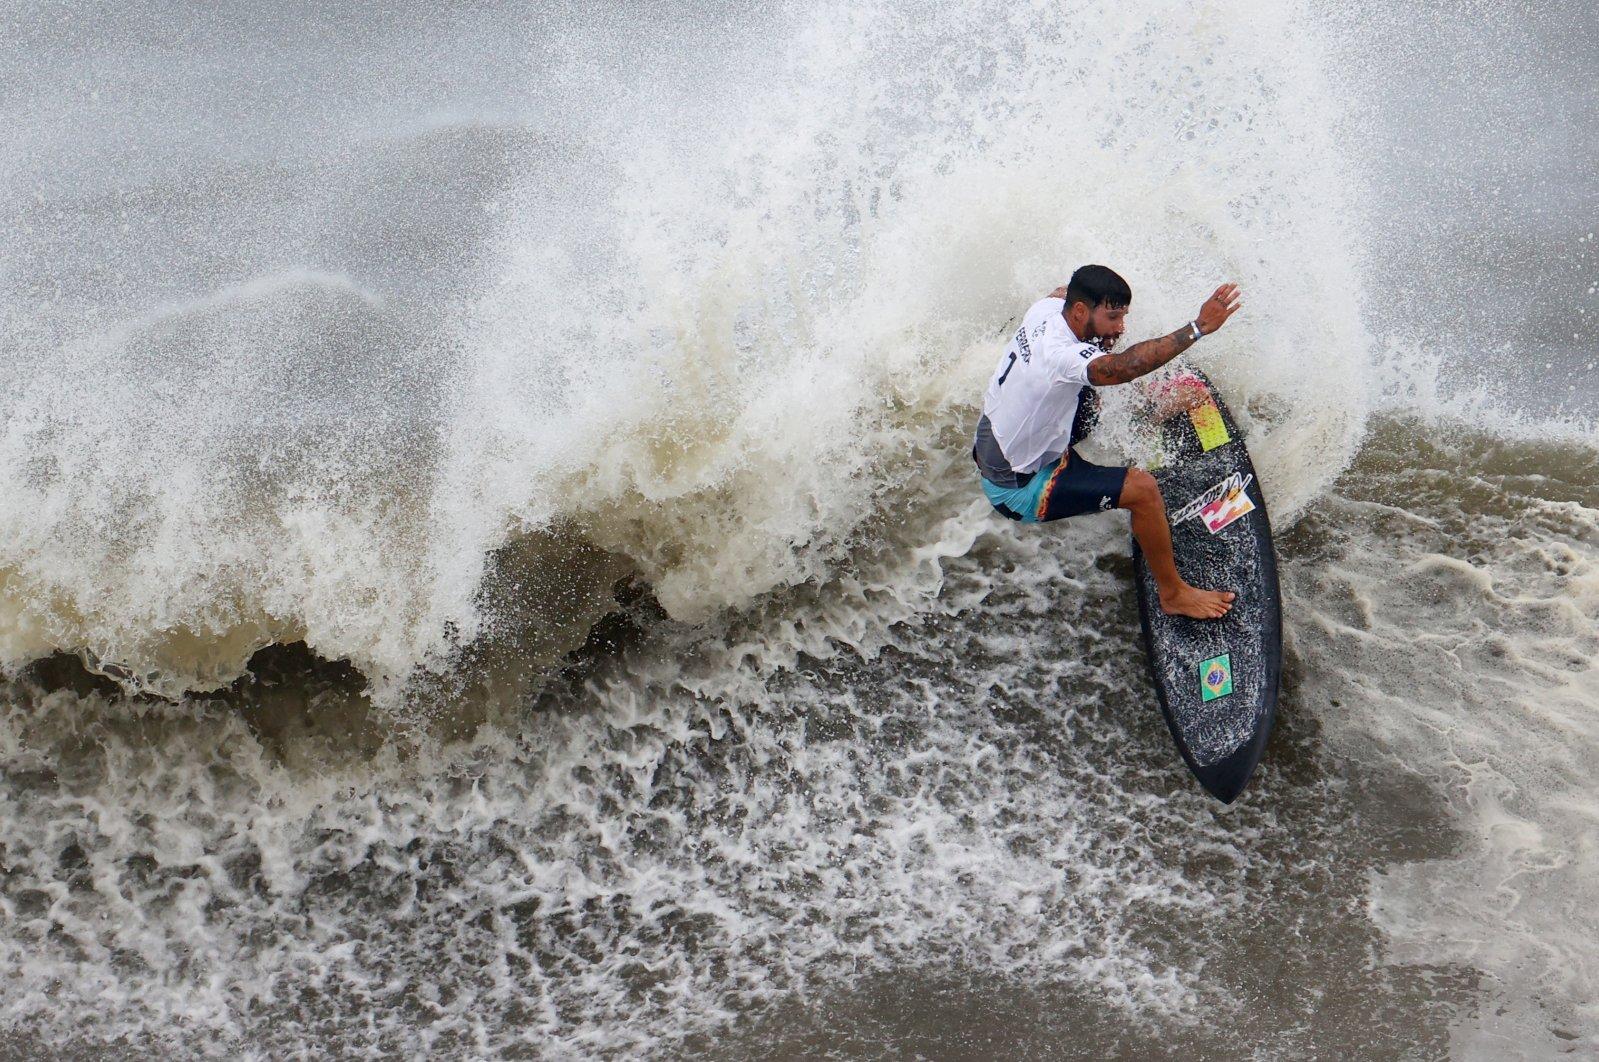 Brazil's Italo Ferreira in action during the Tokyo 2020 Olympics Men's Shortboard Surfing gold medal match at Tsurigasaki Surfing Beach, Chiba, Japan, July 27, 2021.